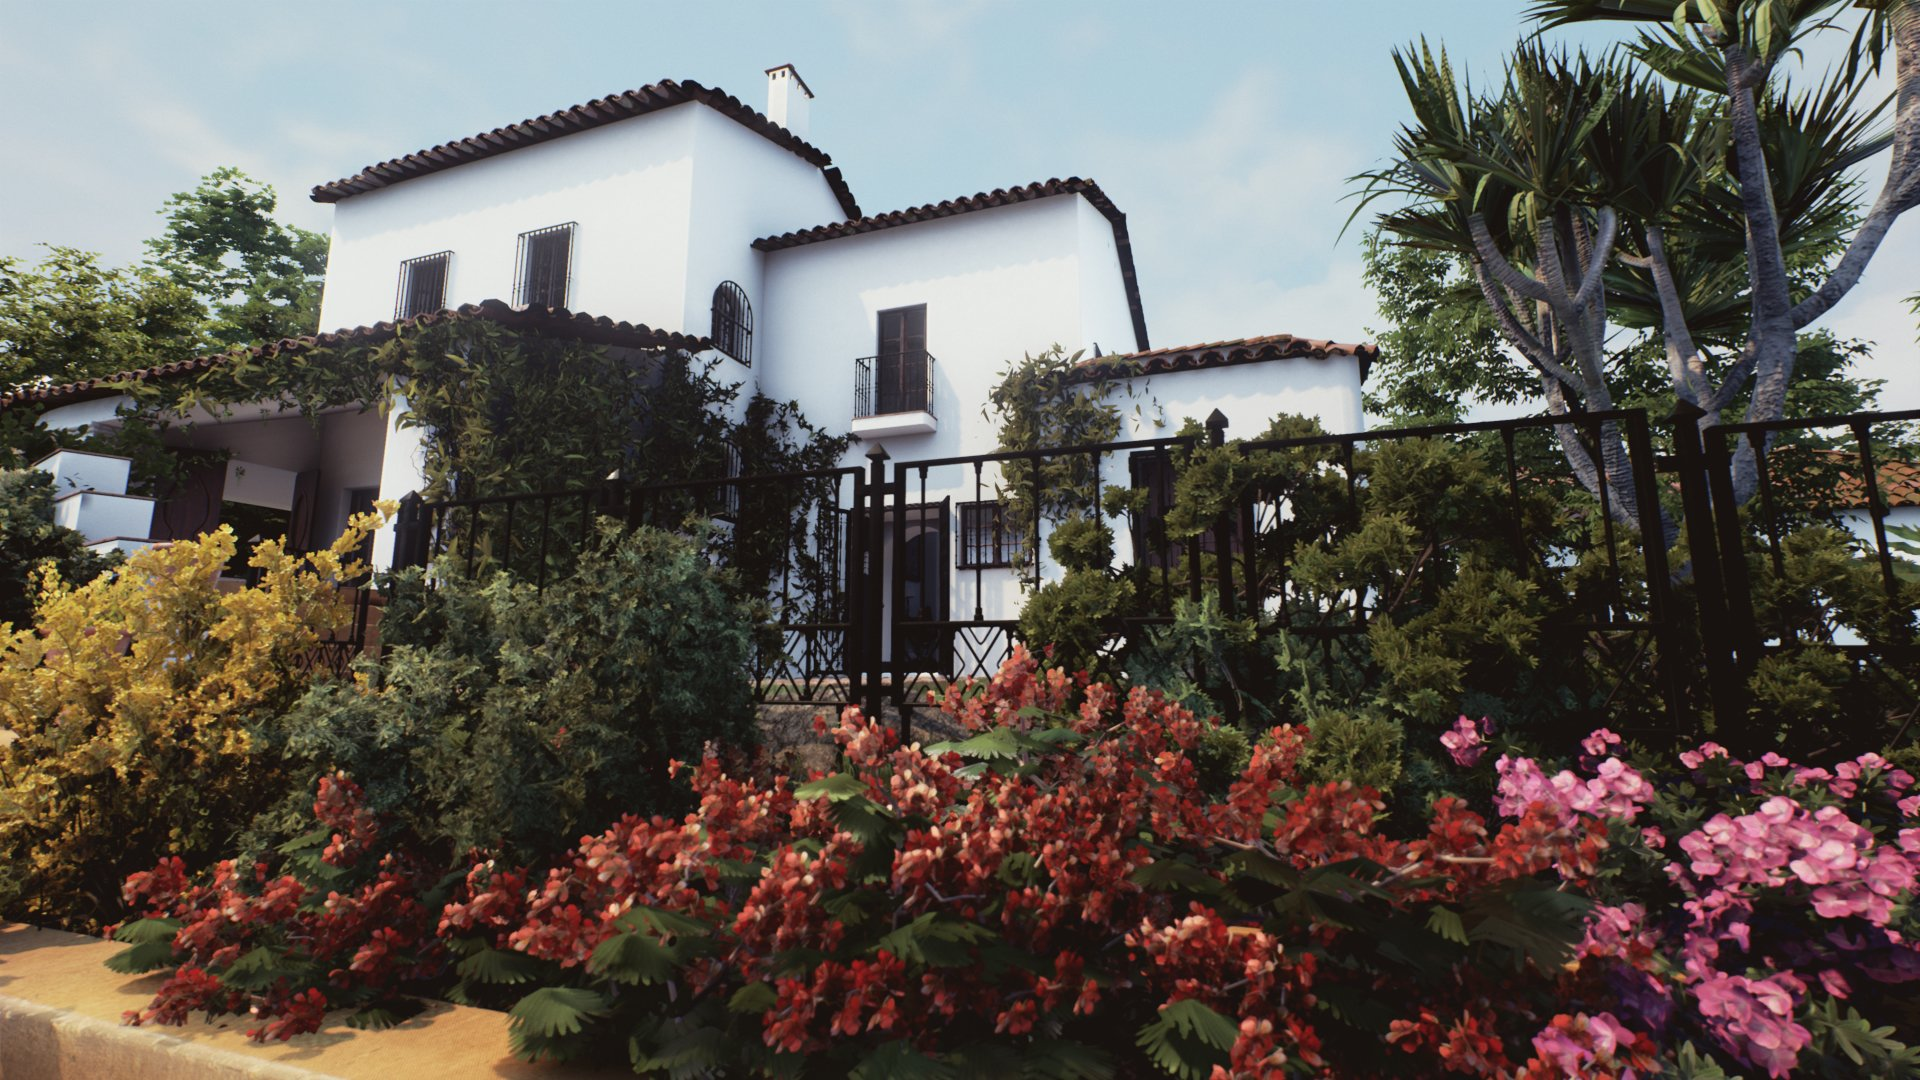 hacienda_v5_1659_evermotion_958.jpg